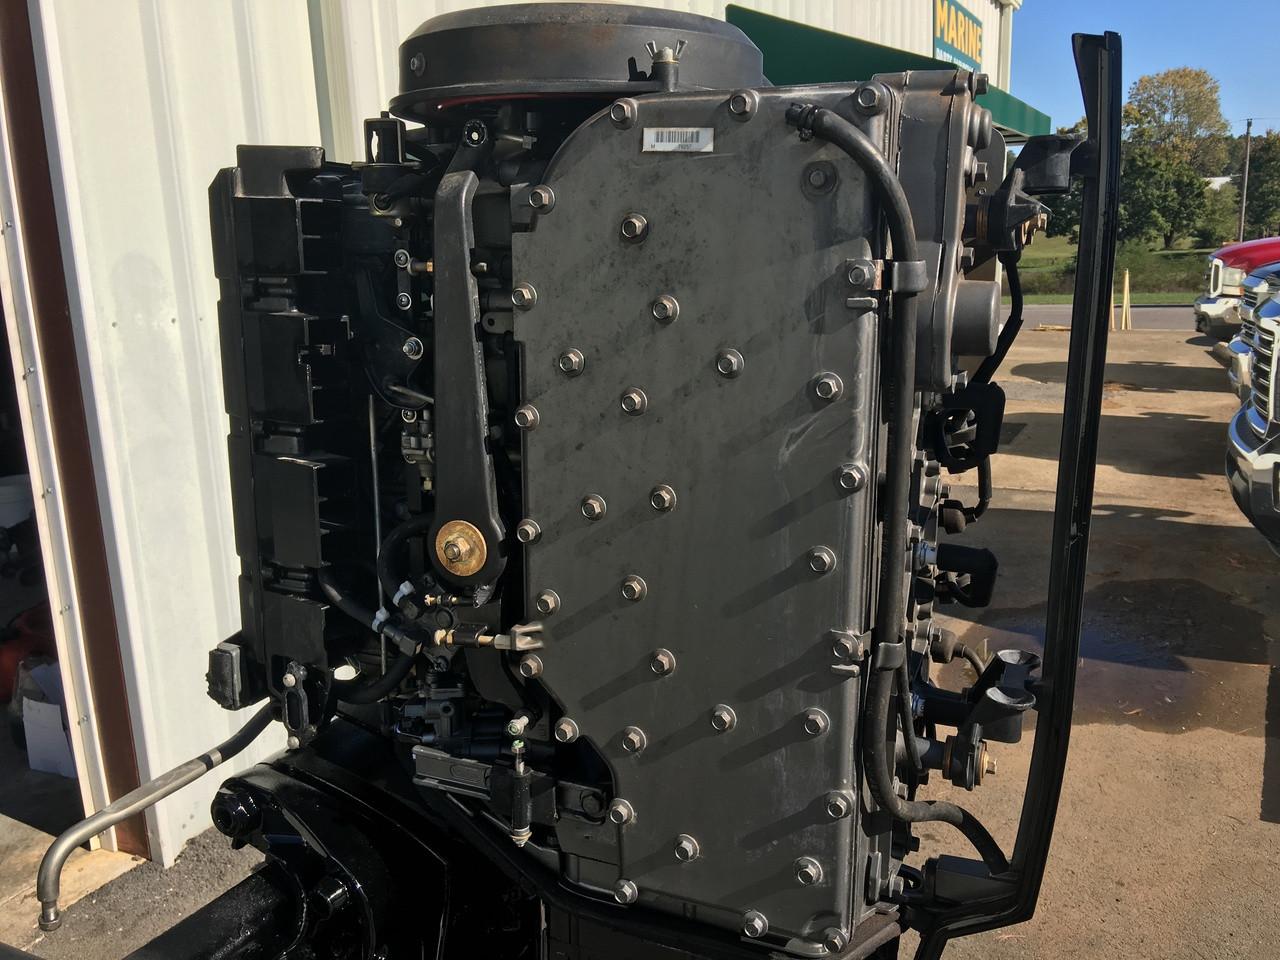 1990 Mercury 115 Hp 4 Cylinder Carbureted 2 Stroke 20 Outboard Motor